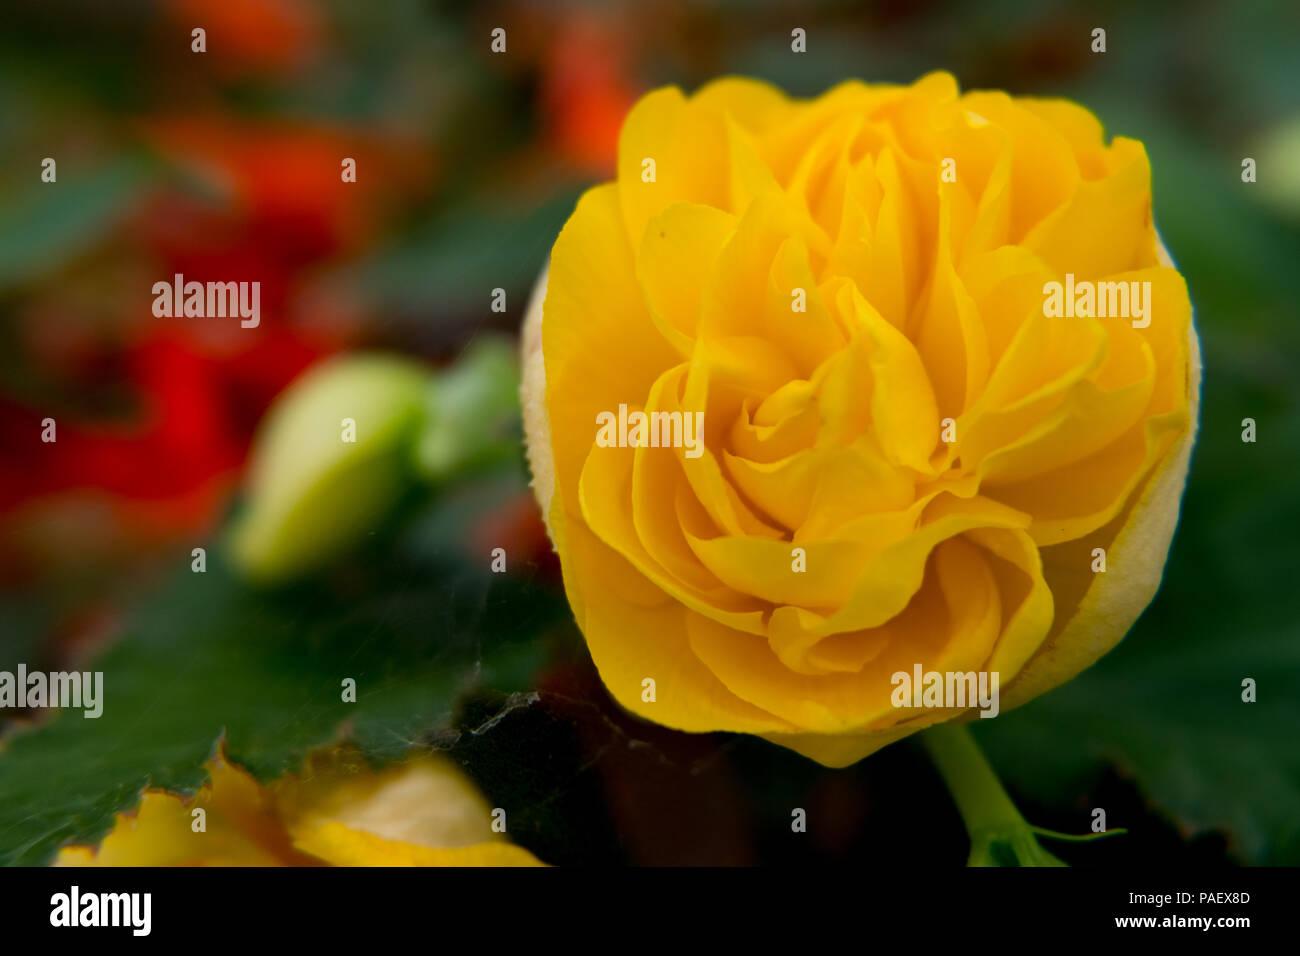 Beautiful Yellow Rose Flower Wallpaper Stock Photo 212998925 Alamy